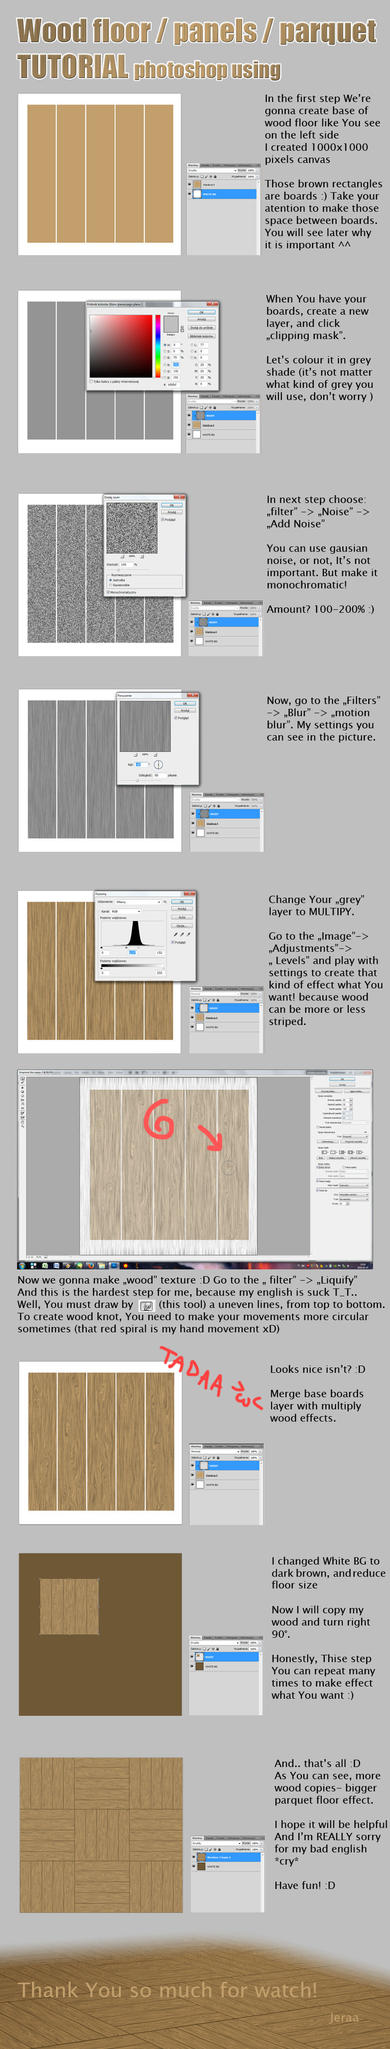 Wood Floor Tutorial by Yeraa